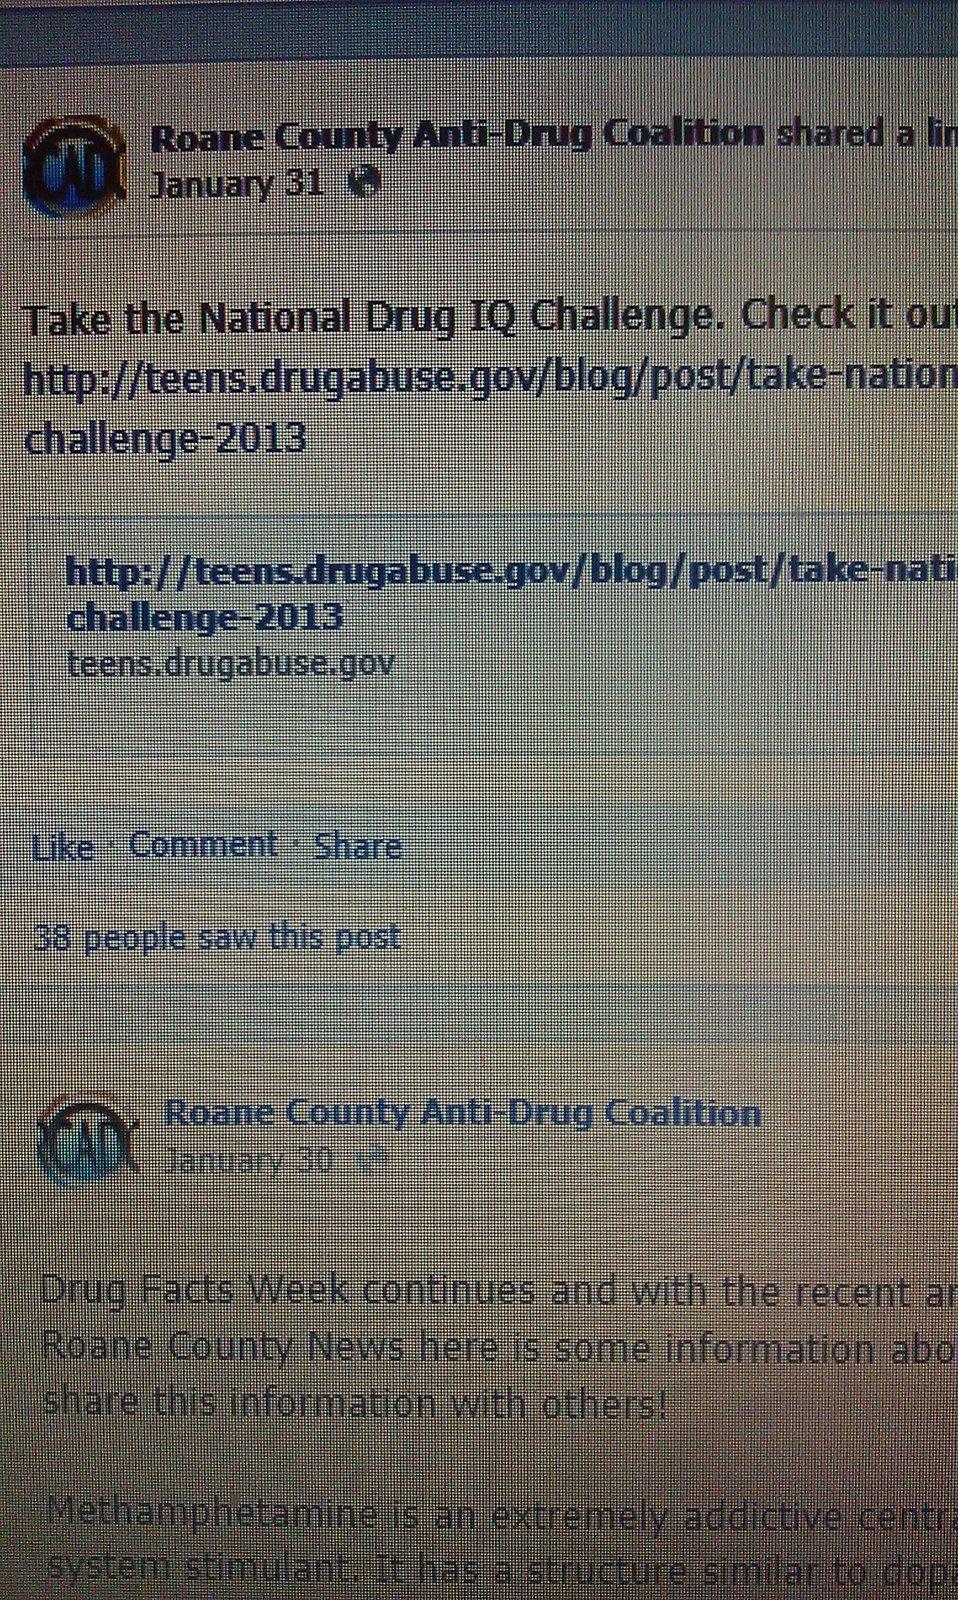 Tennessee's IQ Challenge NDFW 2013